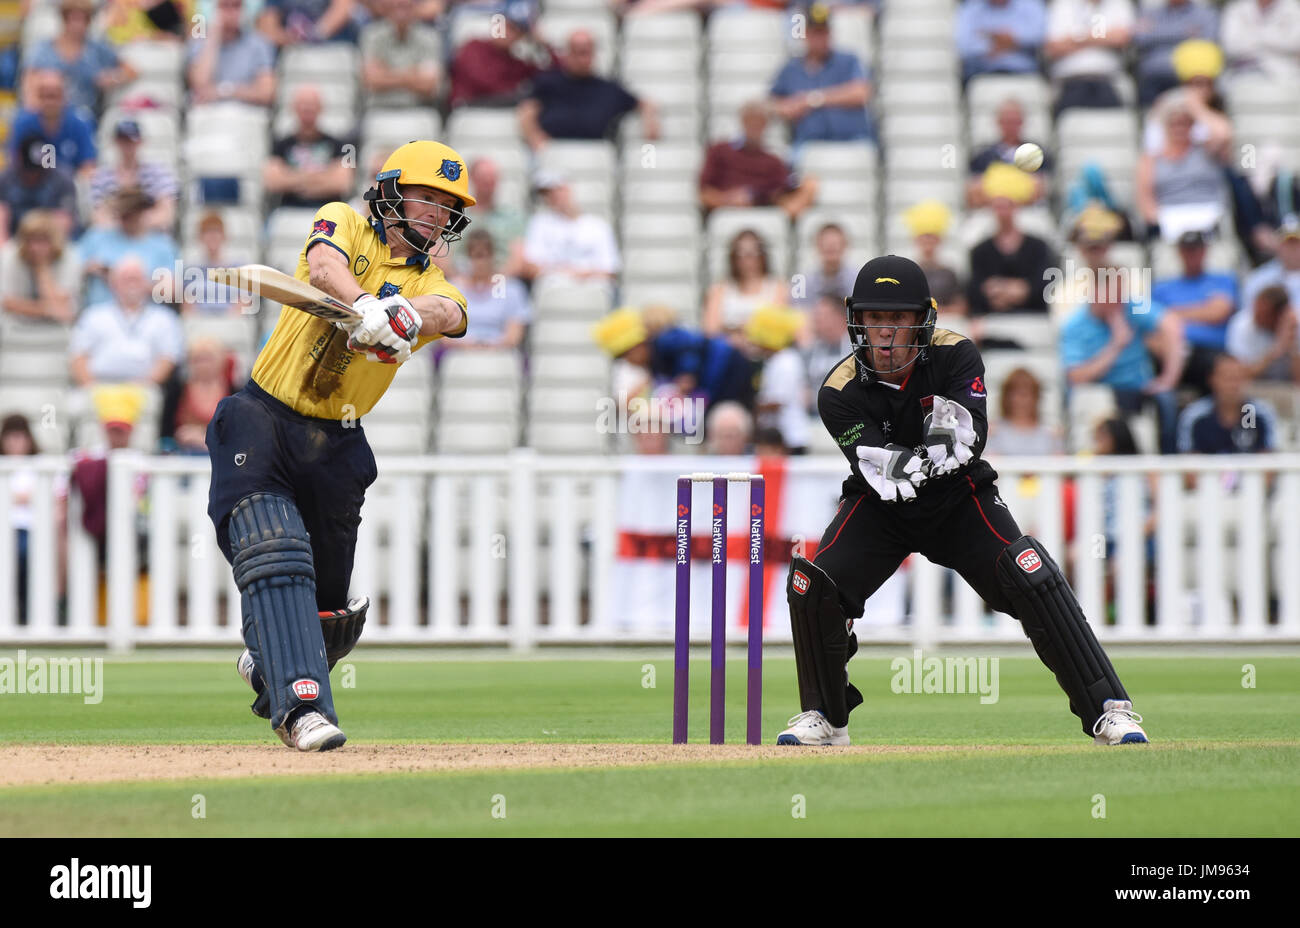 Warwickshire batsman cricketer William Porterfield and Leicester wicket keeper Luke Ronchi - Stock Image